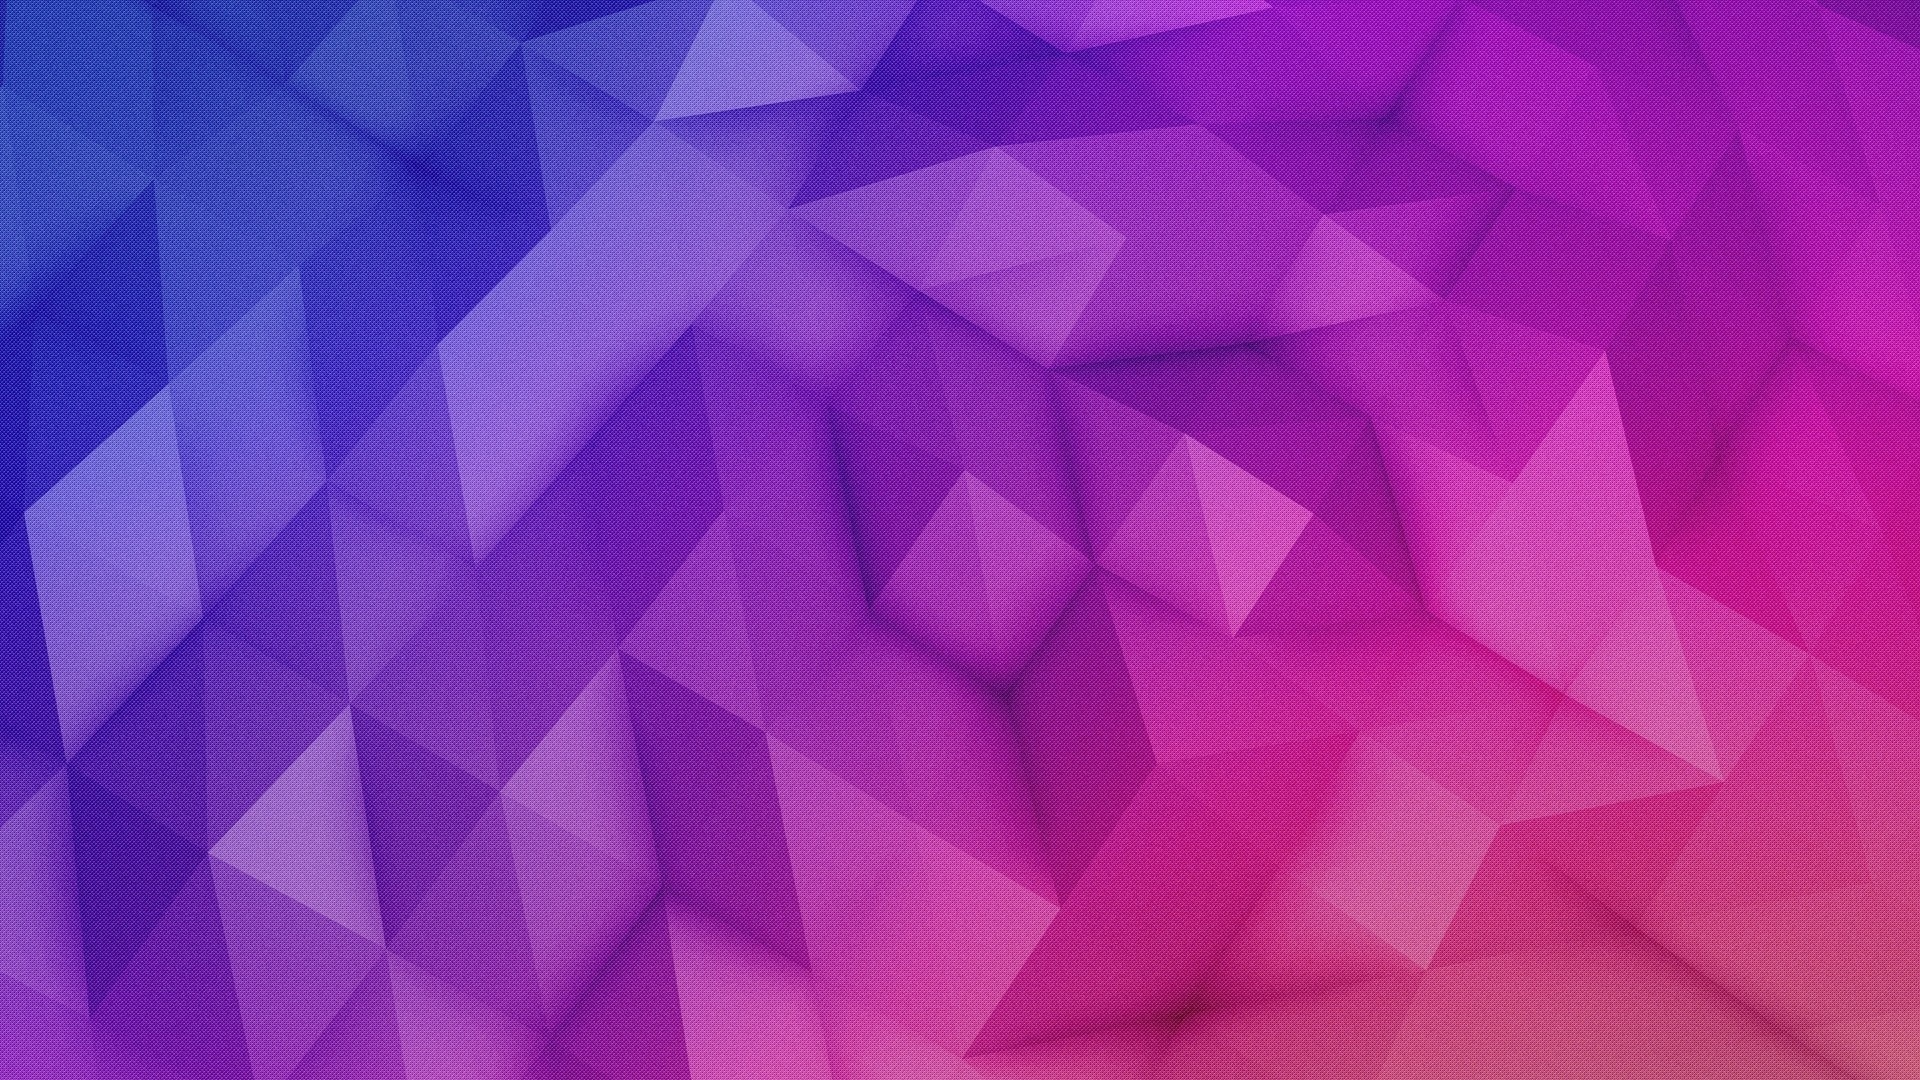 pink geometric wallpaper tumblr – photo #10